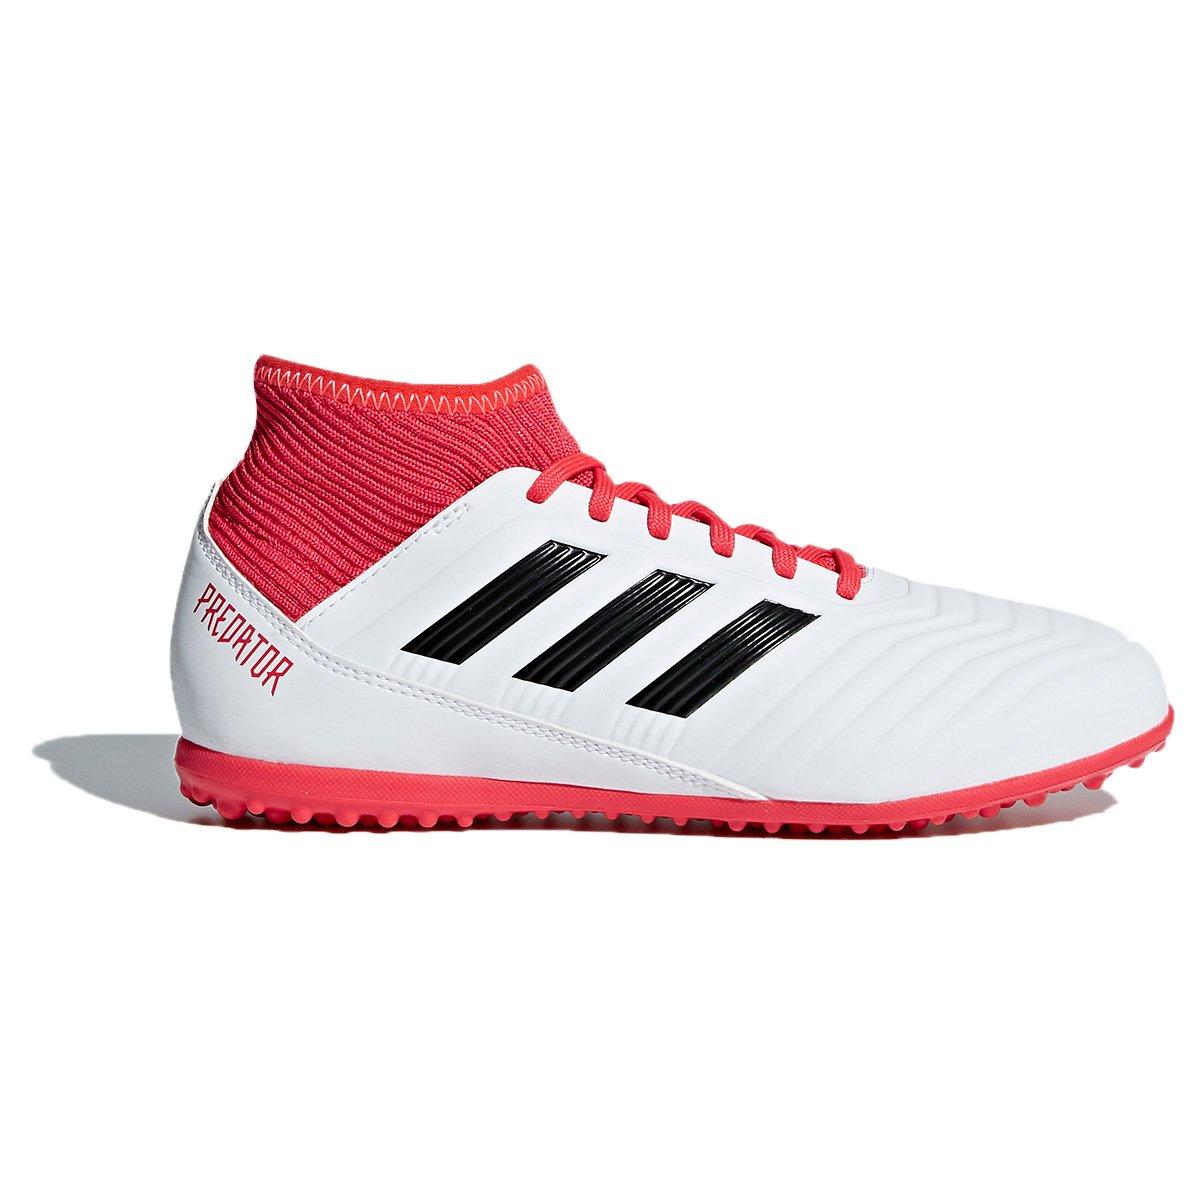 739bddef25 Chuteira Society Infantil Adidas Predator 18.3 TF